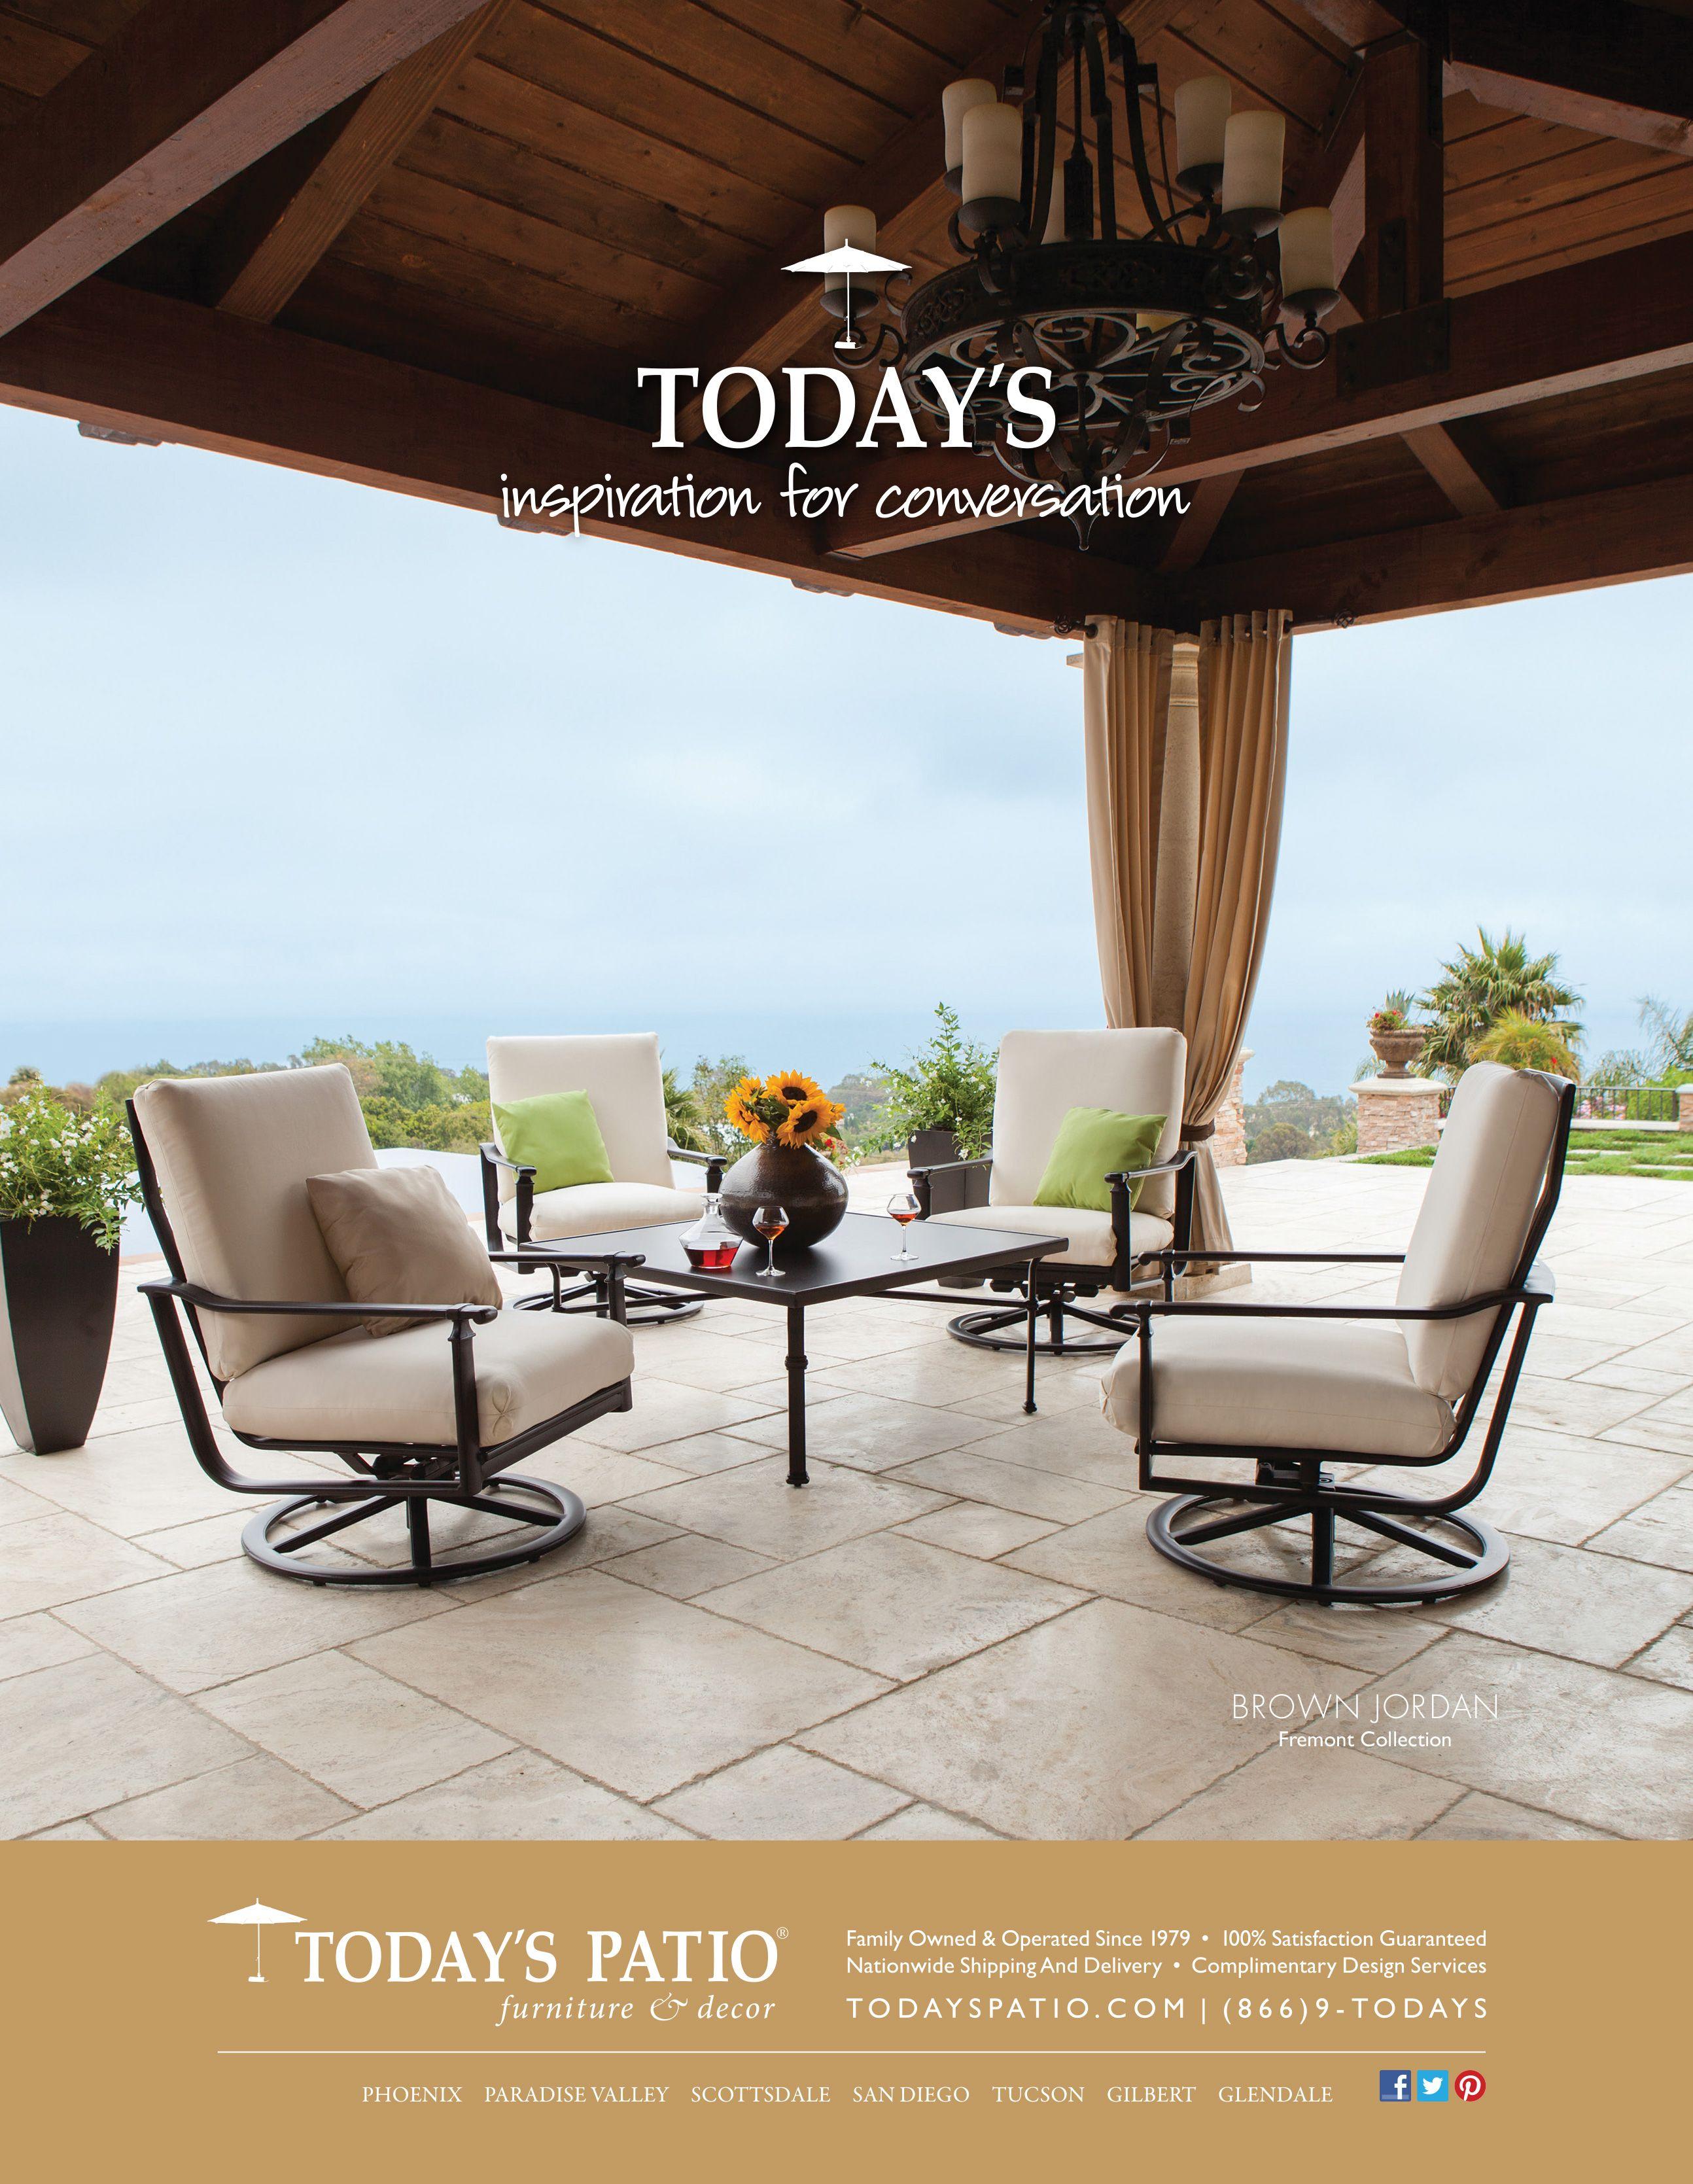 patio pool patio furniture outdoor